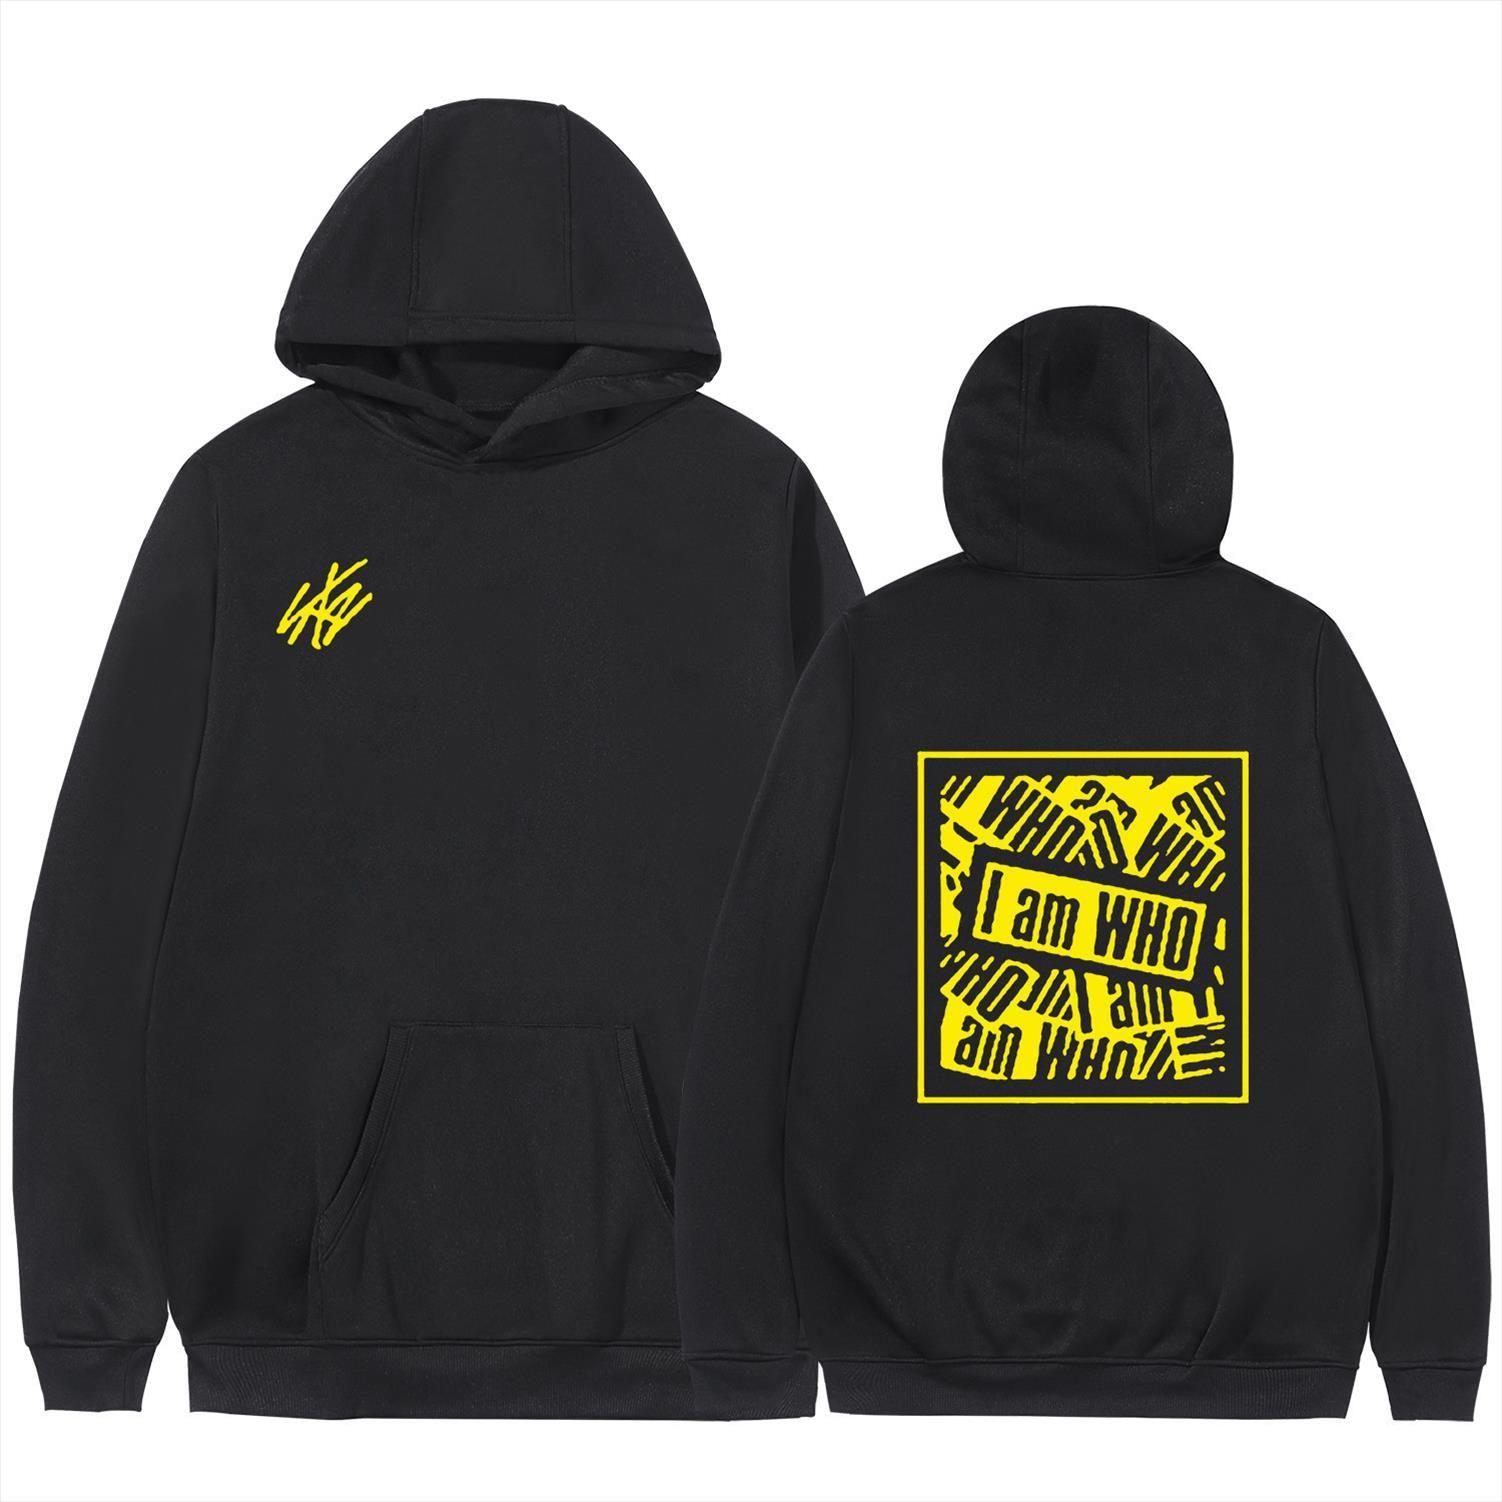 Bonito Straykids Kpop moletom Tops 2020 New Style Sweatshirt Mulheres Oversized 4XL Casual Harajuku Stray Crianças Hoodies com capuz